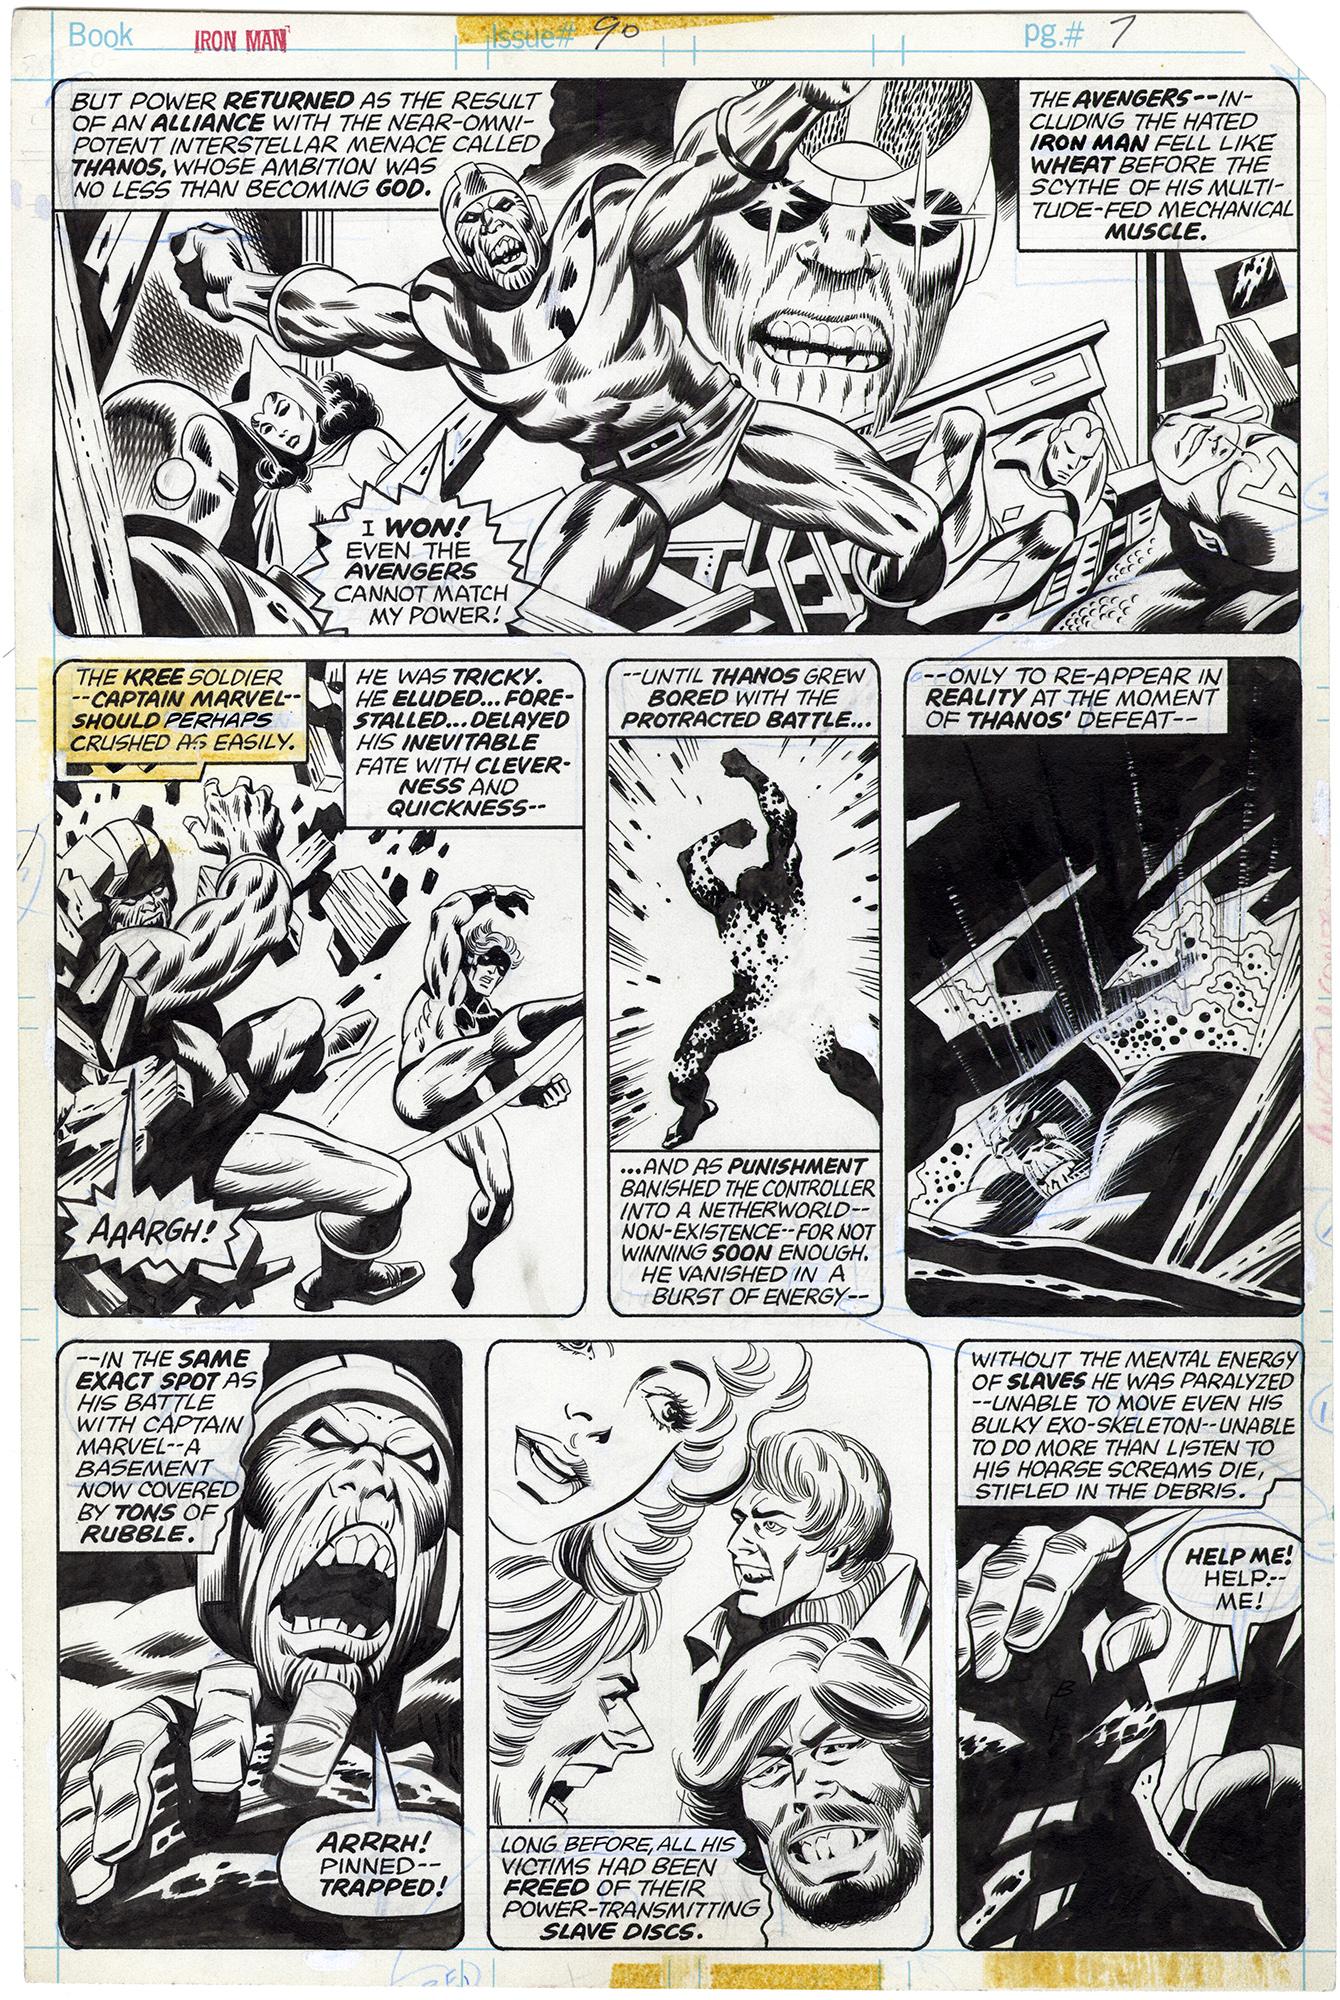 Iron Man #90 p7